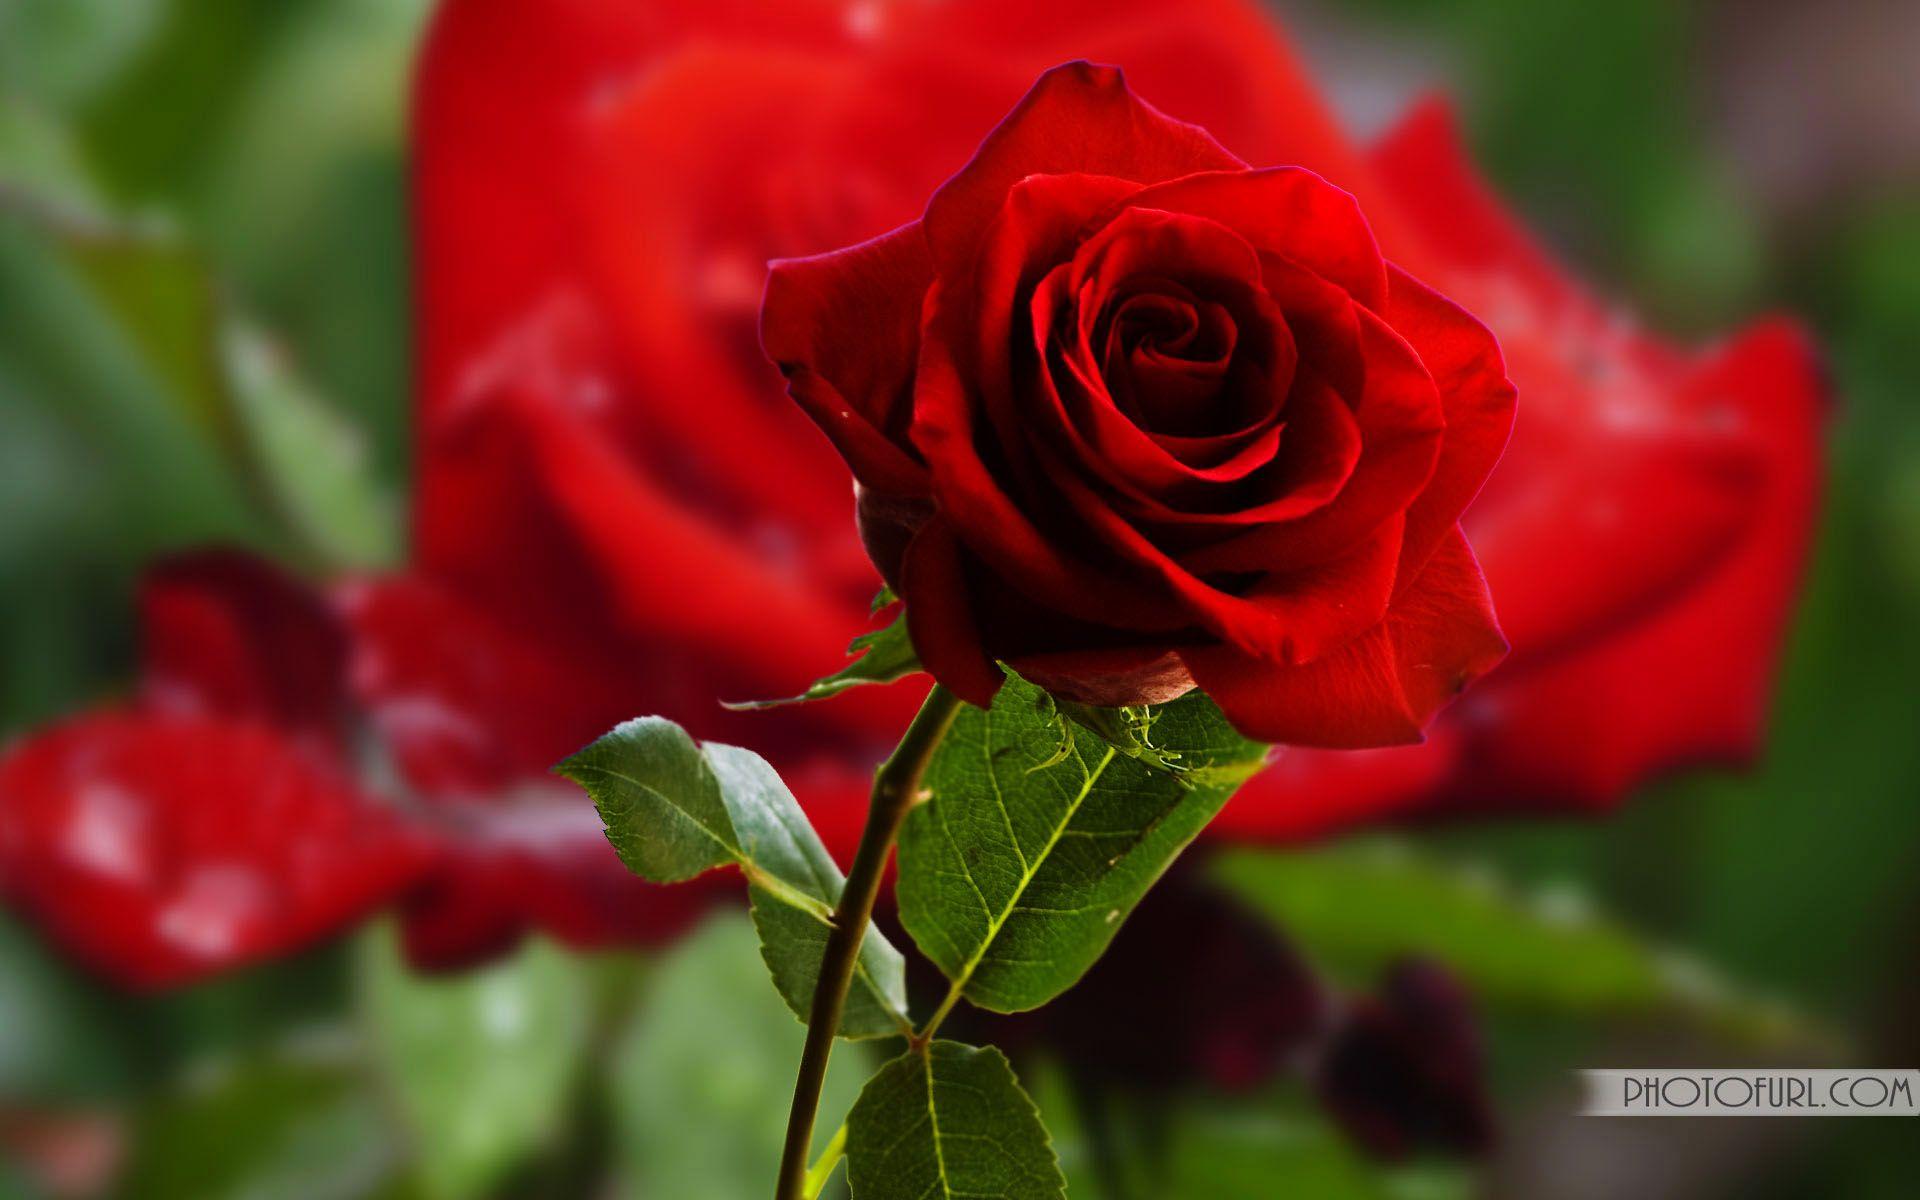 Pin By Sarah Pka On Flowers Pinterest Beautiful Rose Flowers